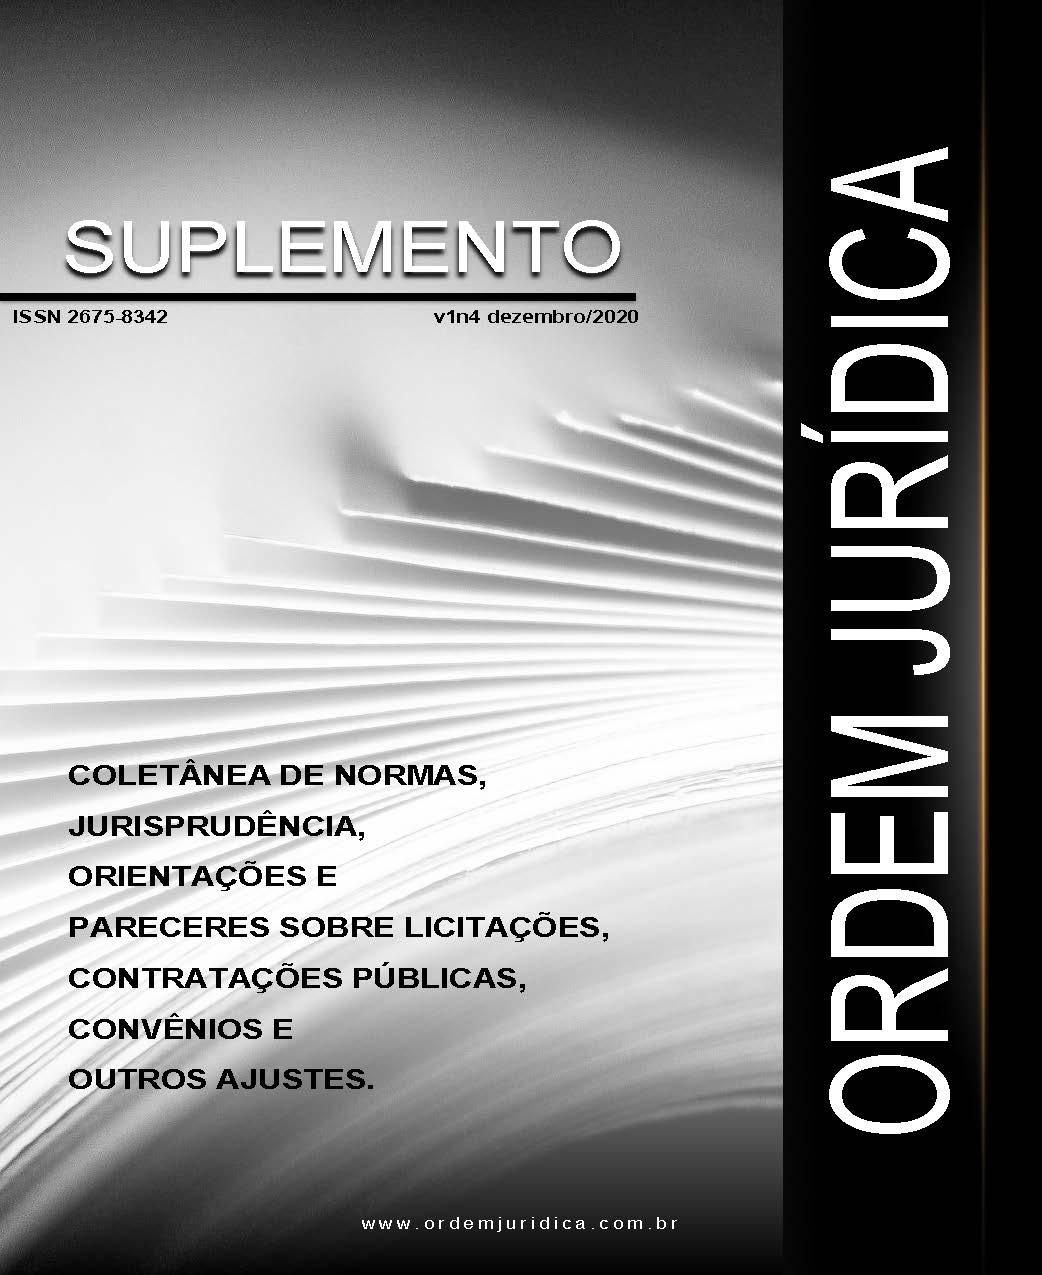 Suplemento Ordem Jurídica Volume 1